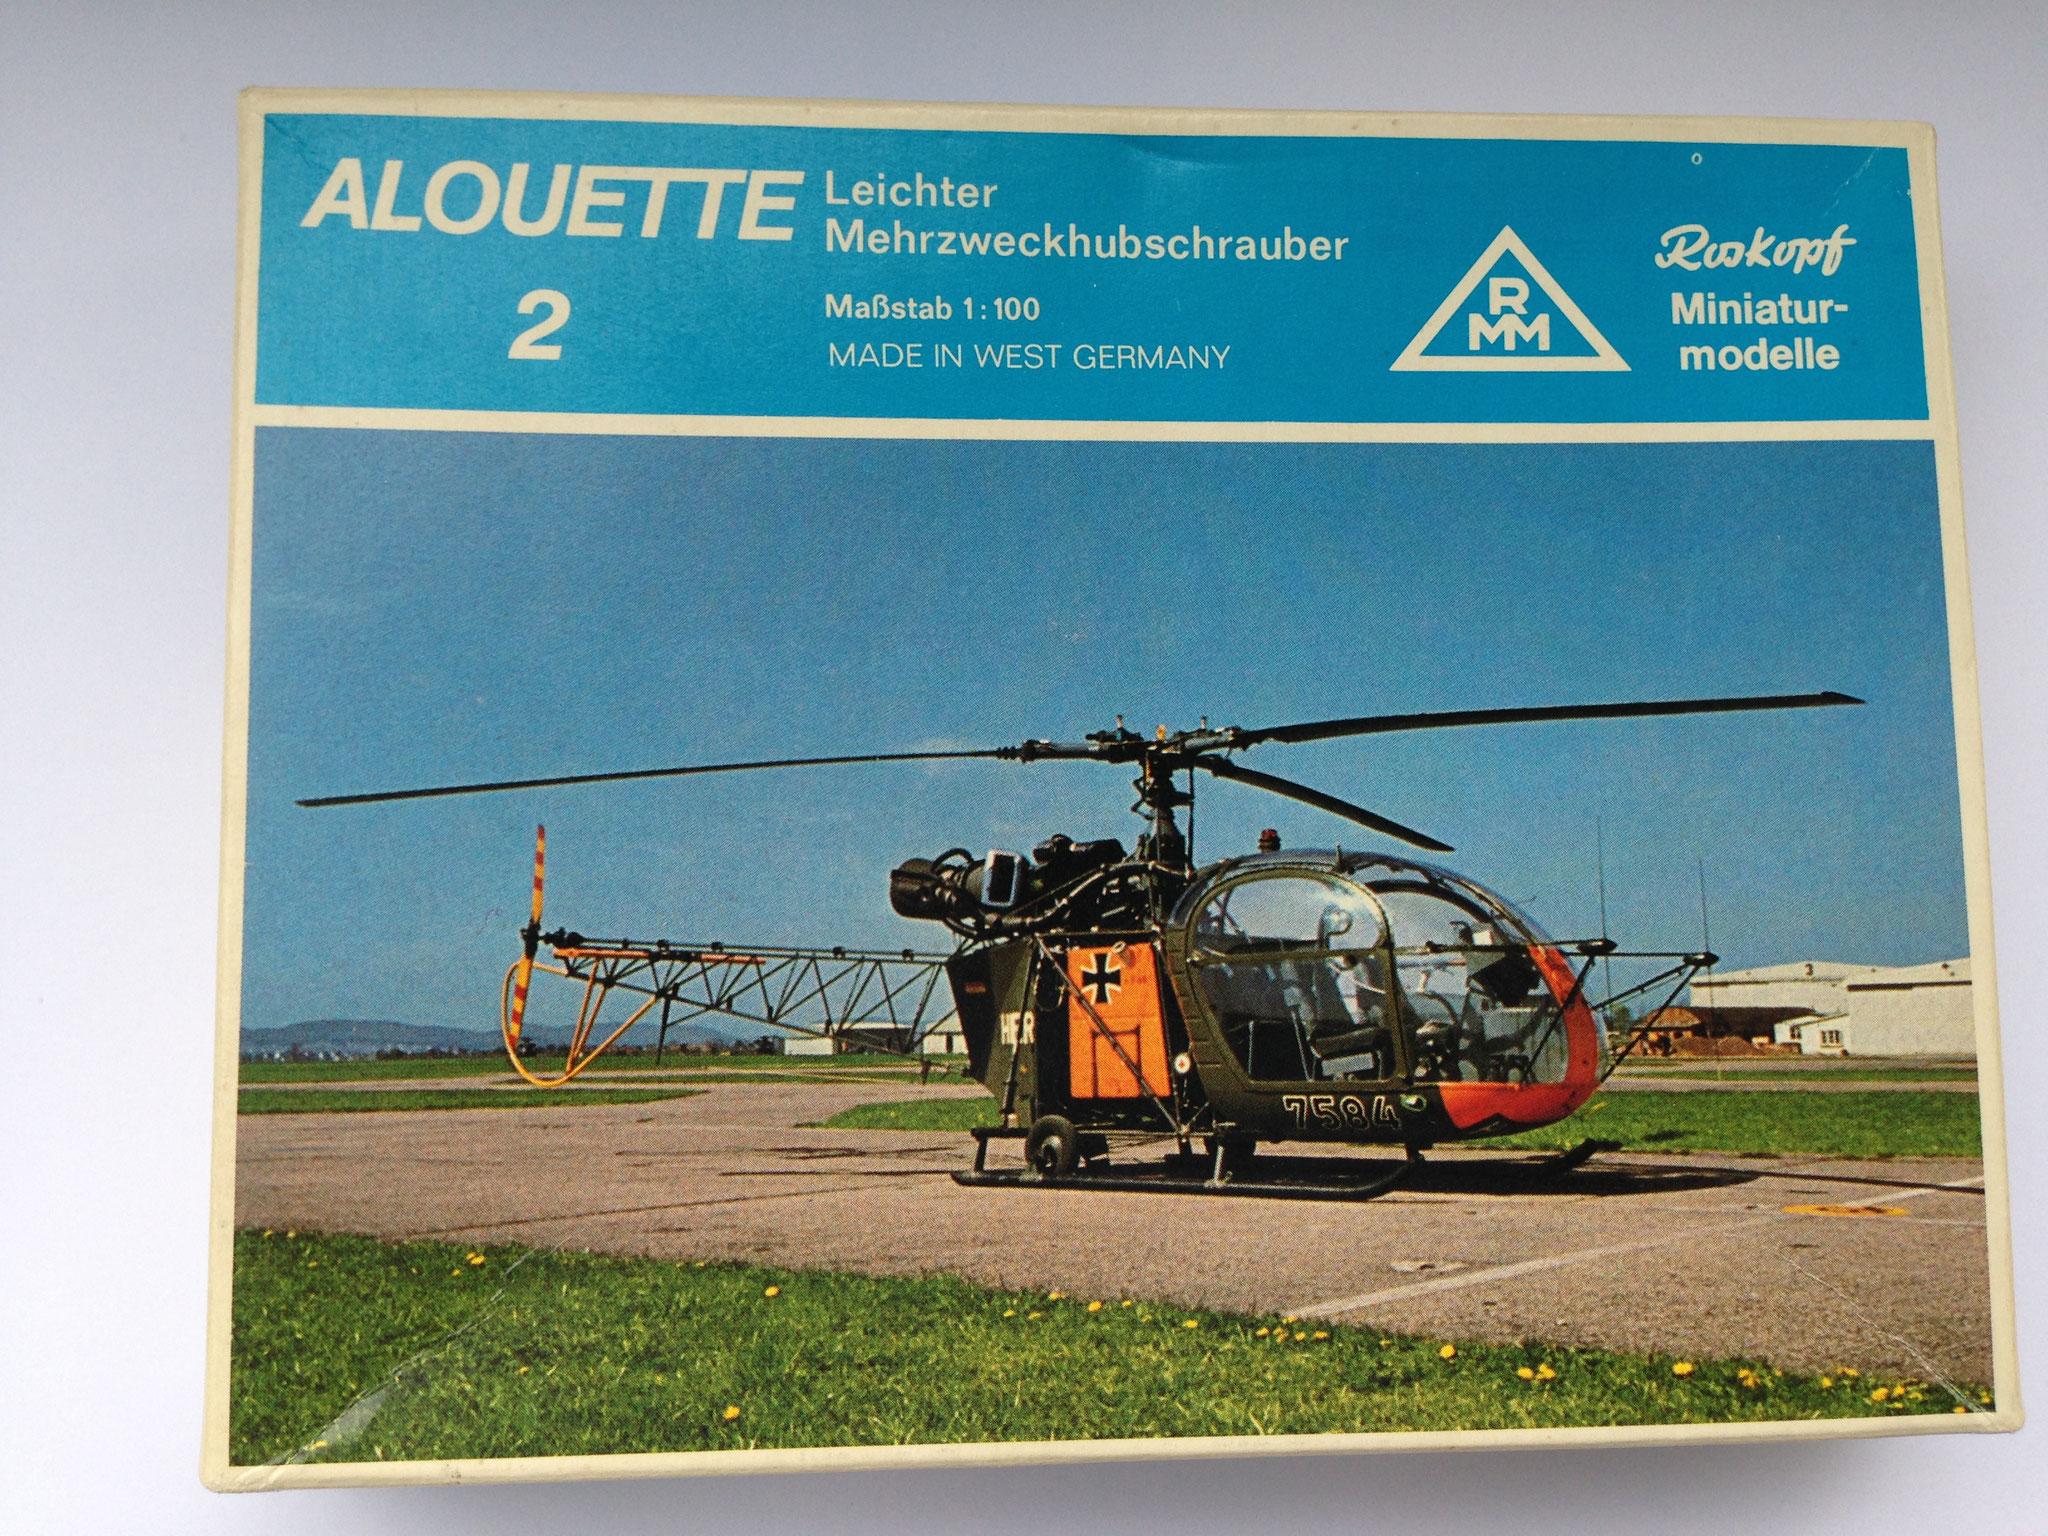 Alouette 2, Verbindungshubschrauber, Bausatz, Art. Nr. 56 (ab 1976 im Programm)